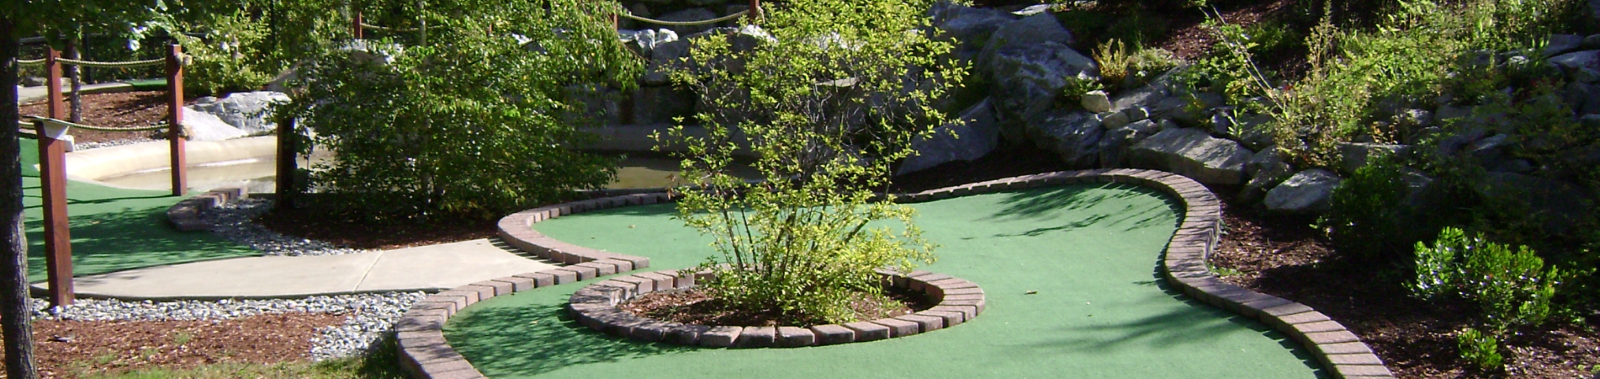 hole 1 mini golf course design